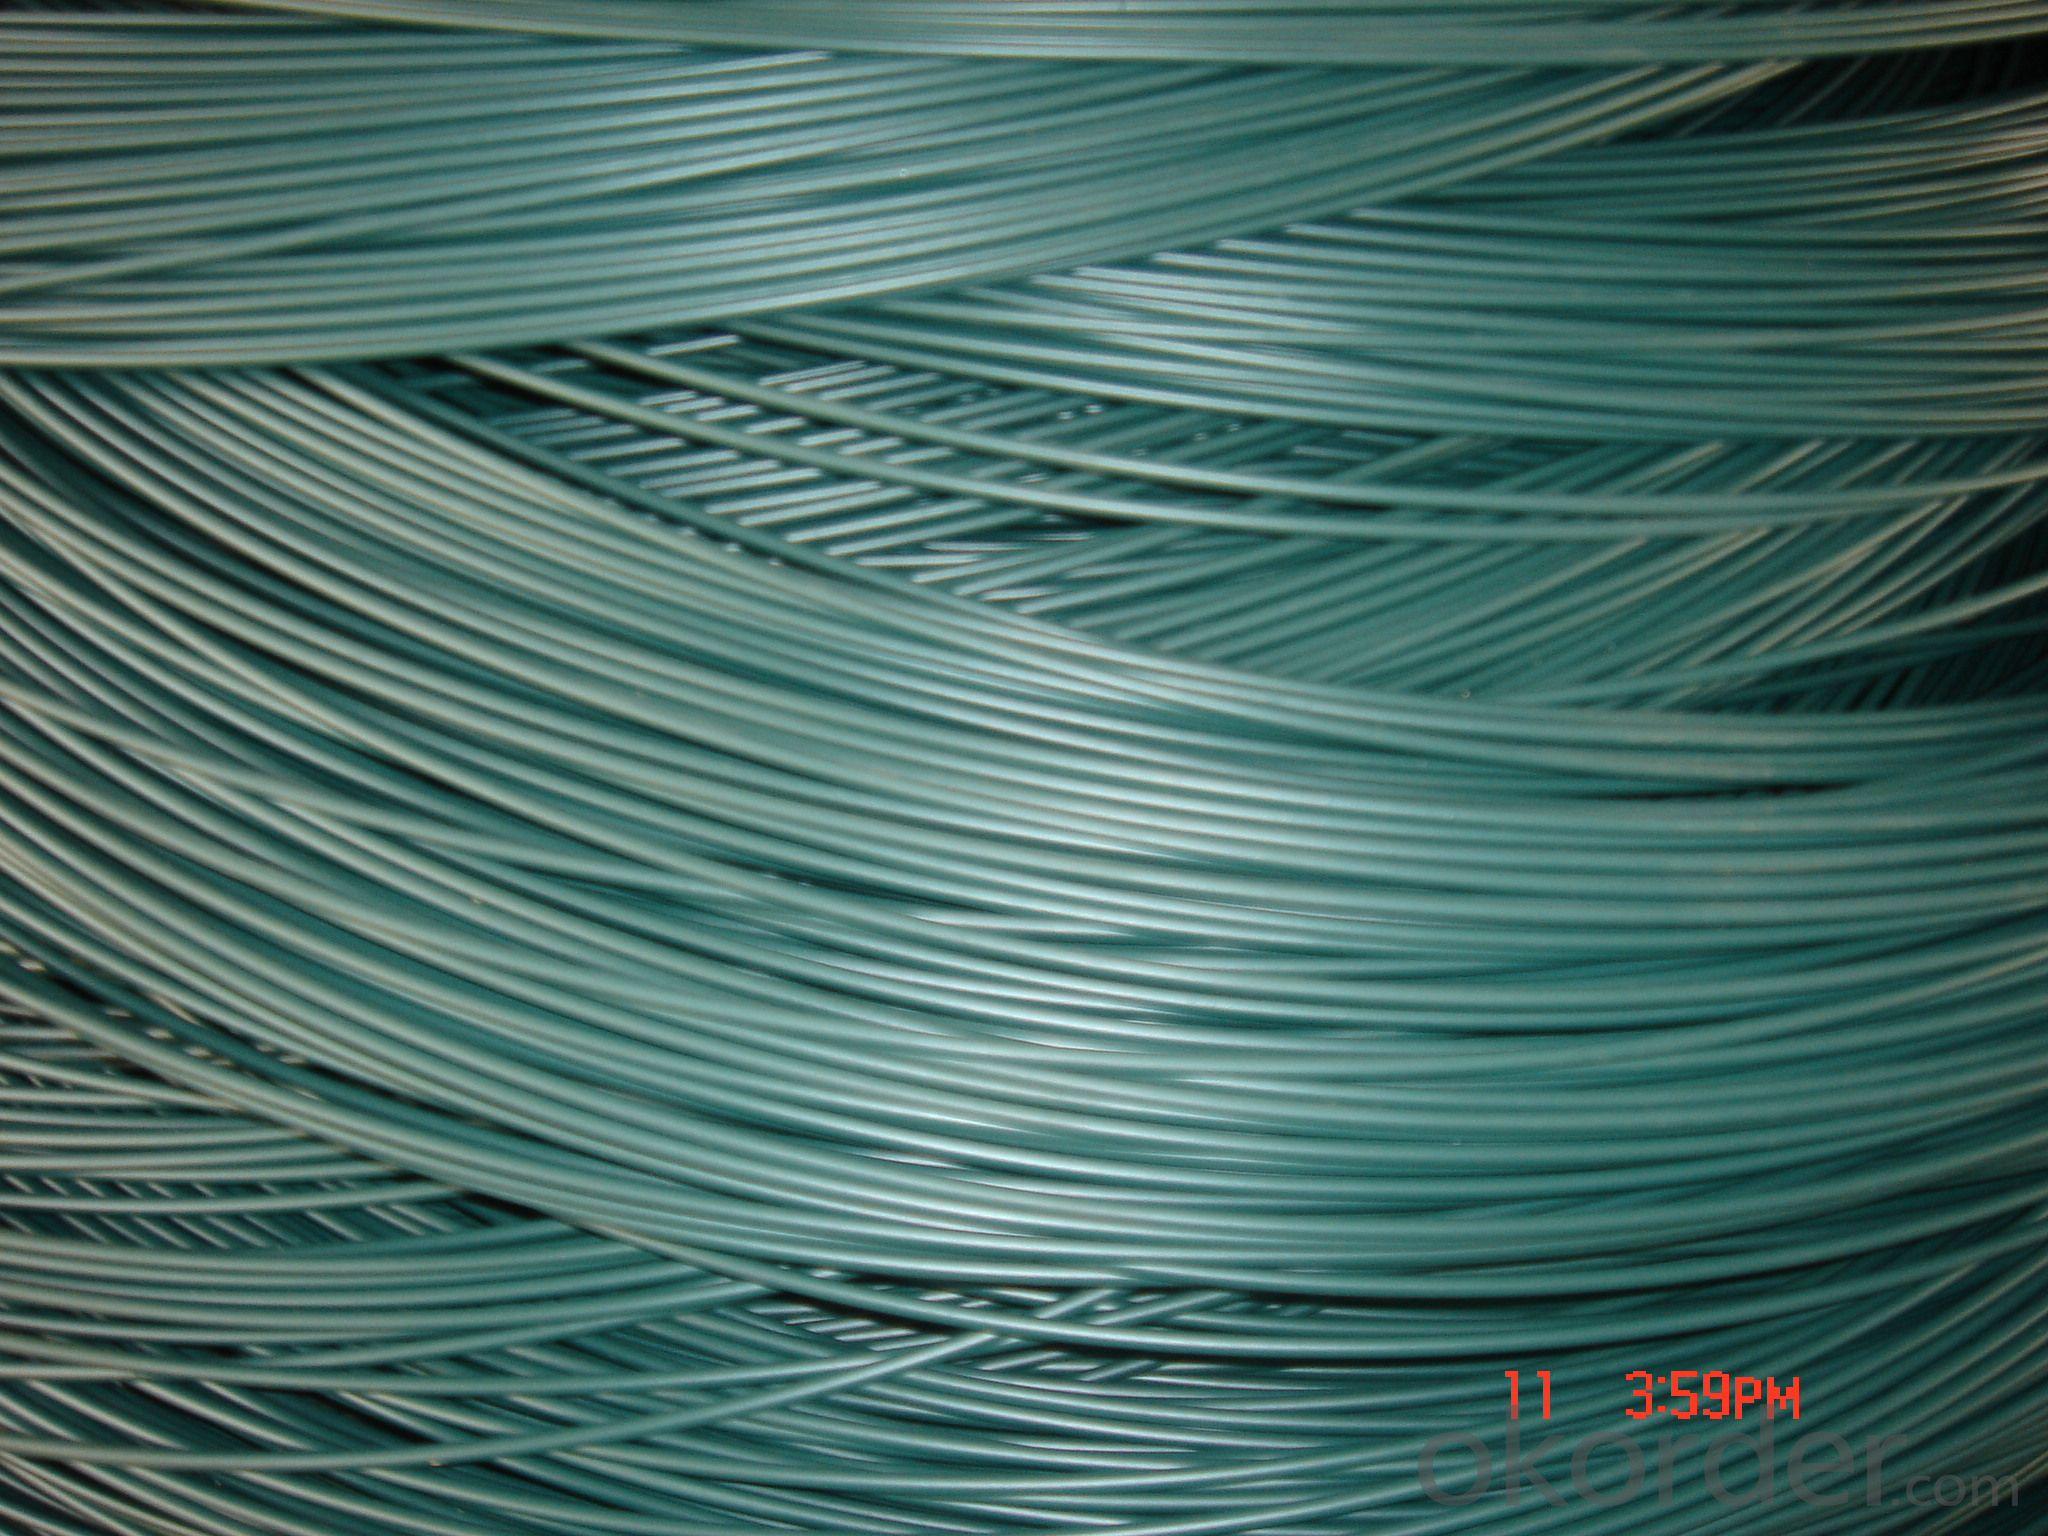 Pvc Coated Wire,Pvc Coated Tie Wire,Pvc Coated Wire